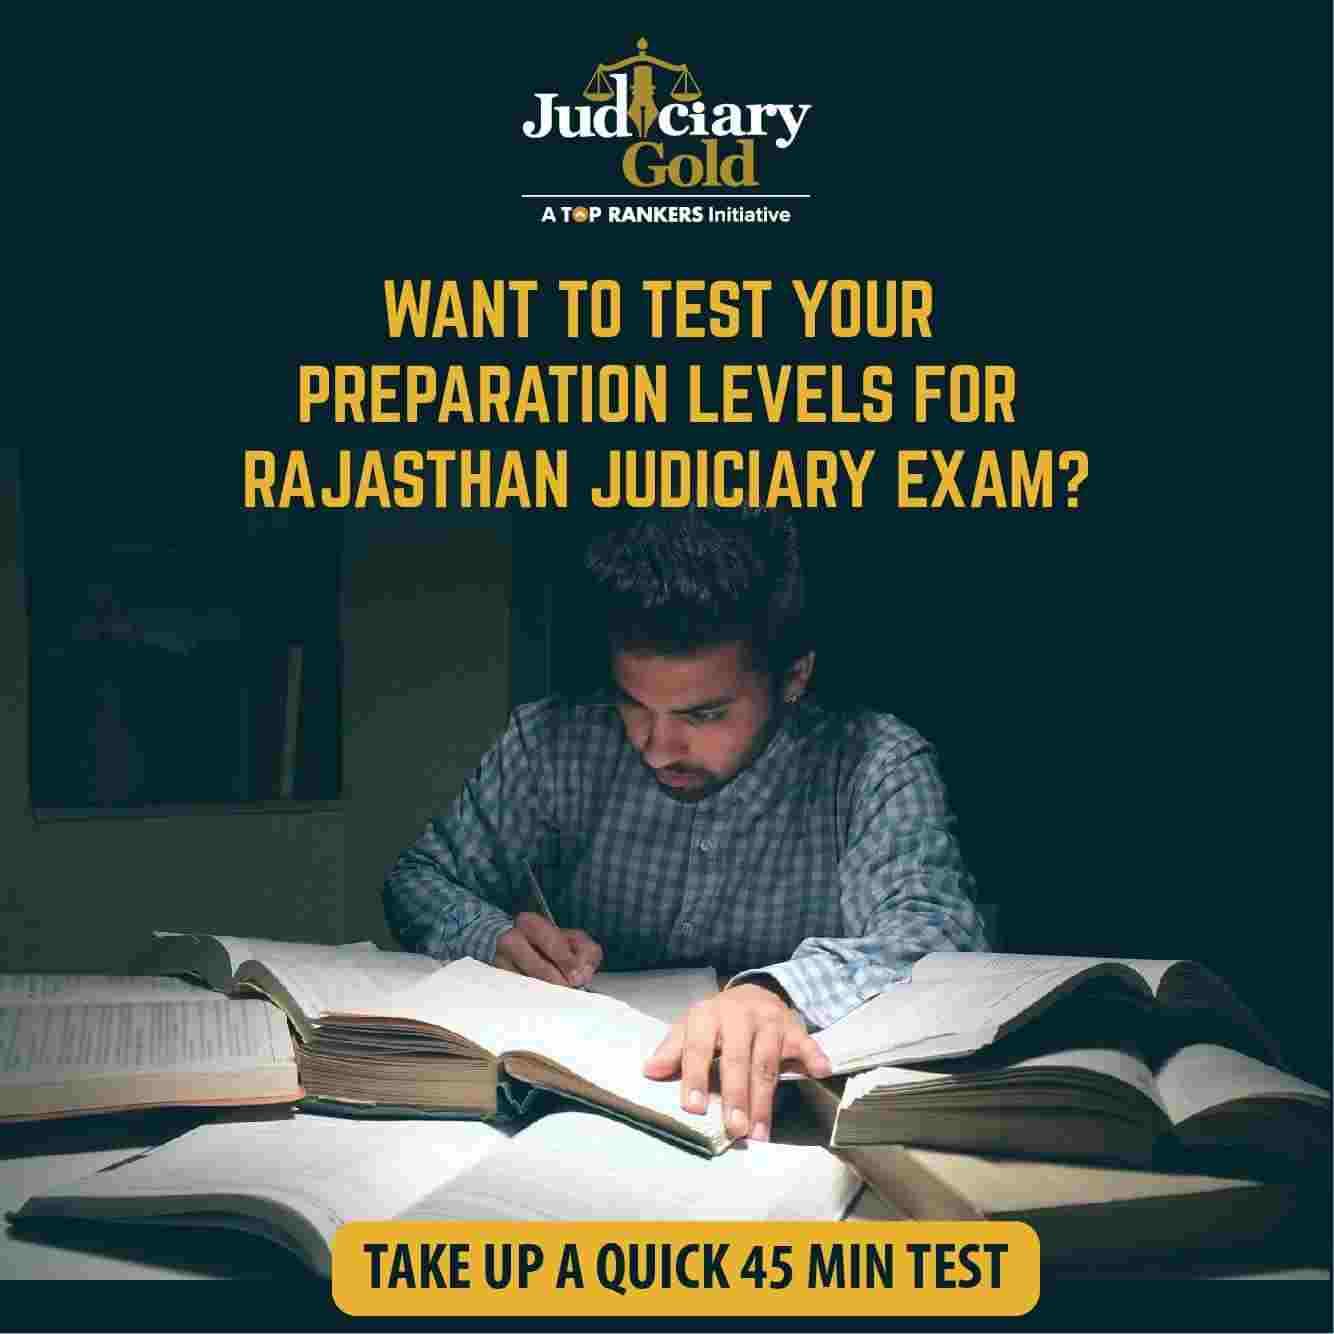 rajasthan Judiciary mock tests